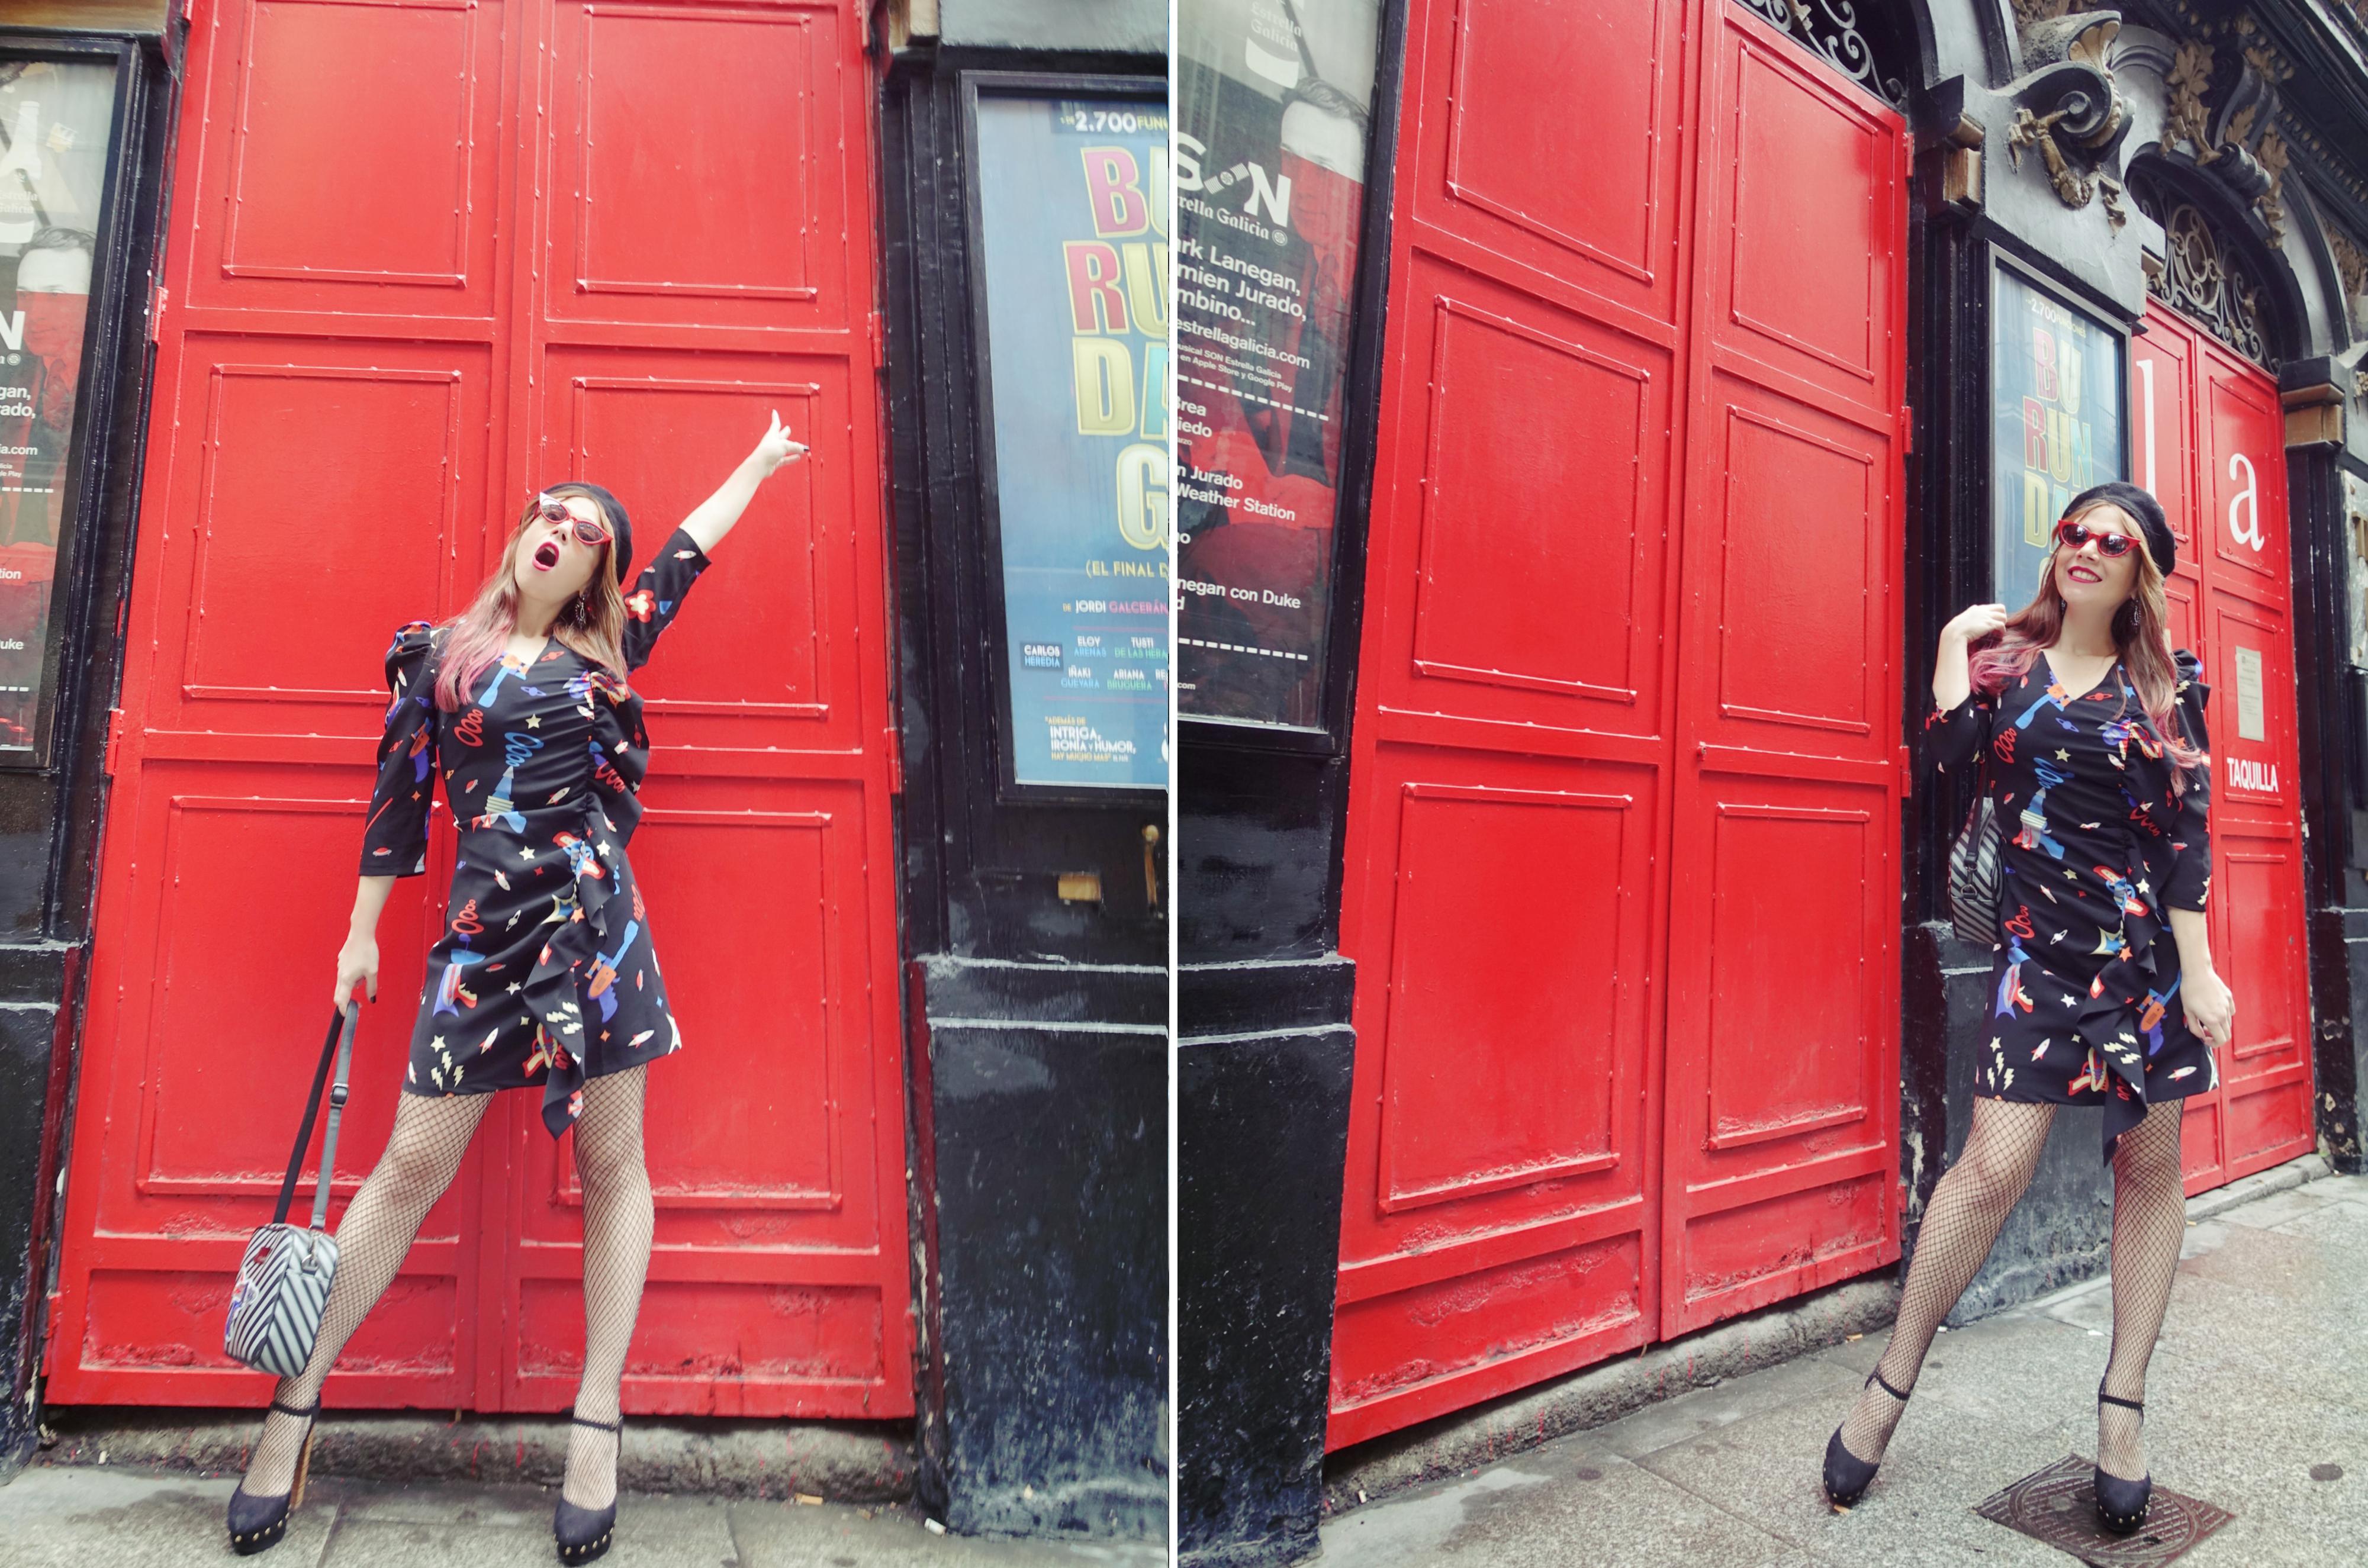 Moda-invierno-2019-PiensaenChic-blog-de-moda-ChicAdicta-influencer-jetsons-dress-Minueto-fashionista-vestidos-divertidos-pelo-rosa-Chic-adicta-Piensa-en-Chic